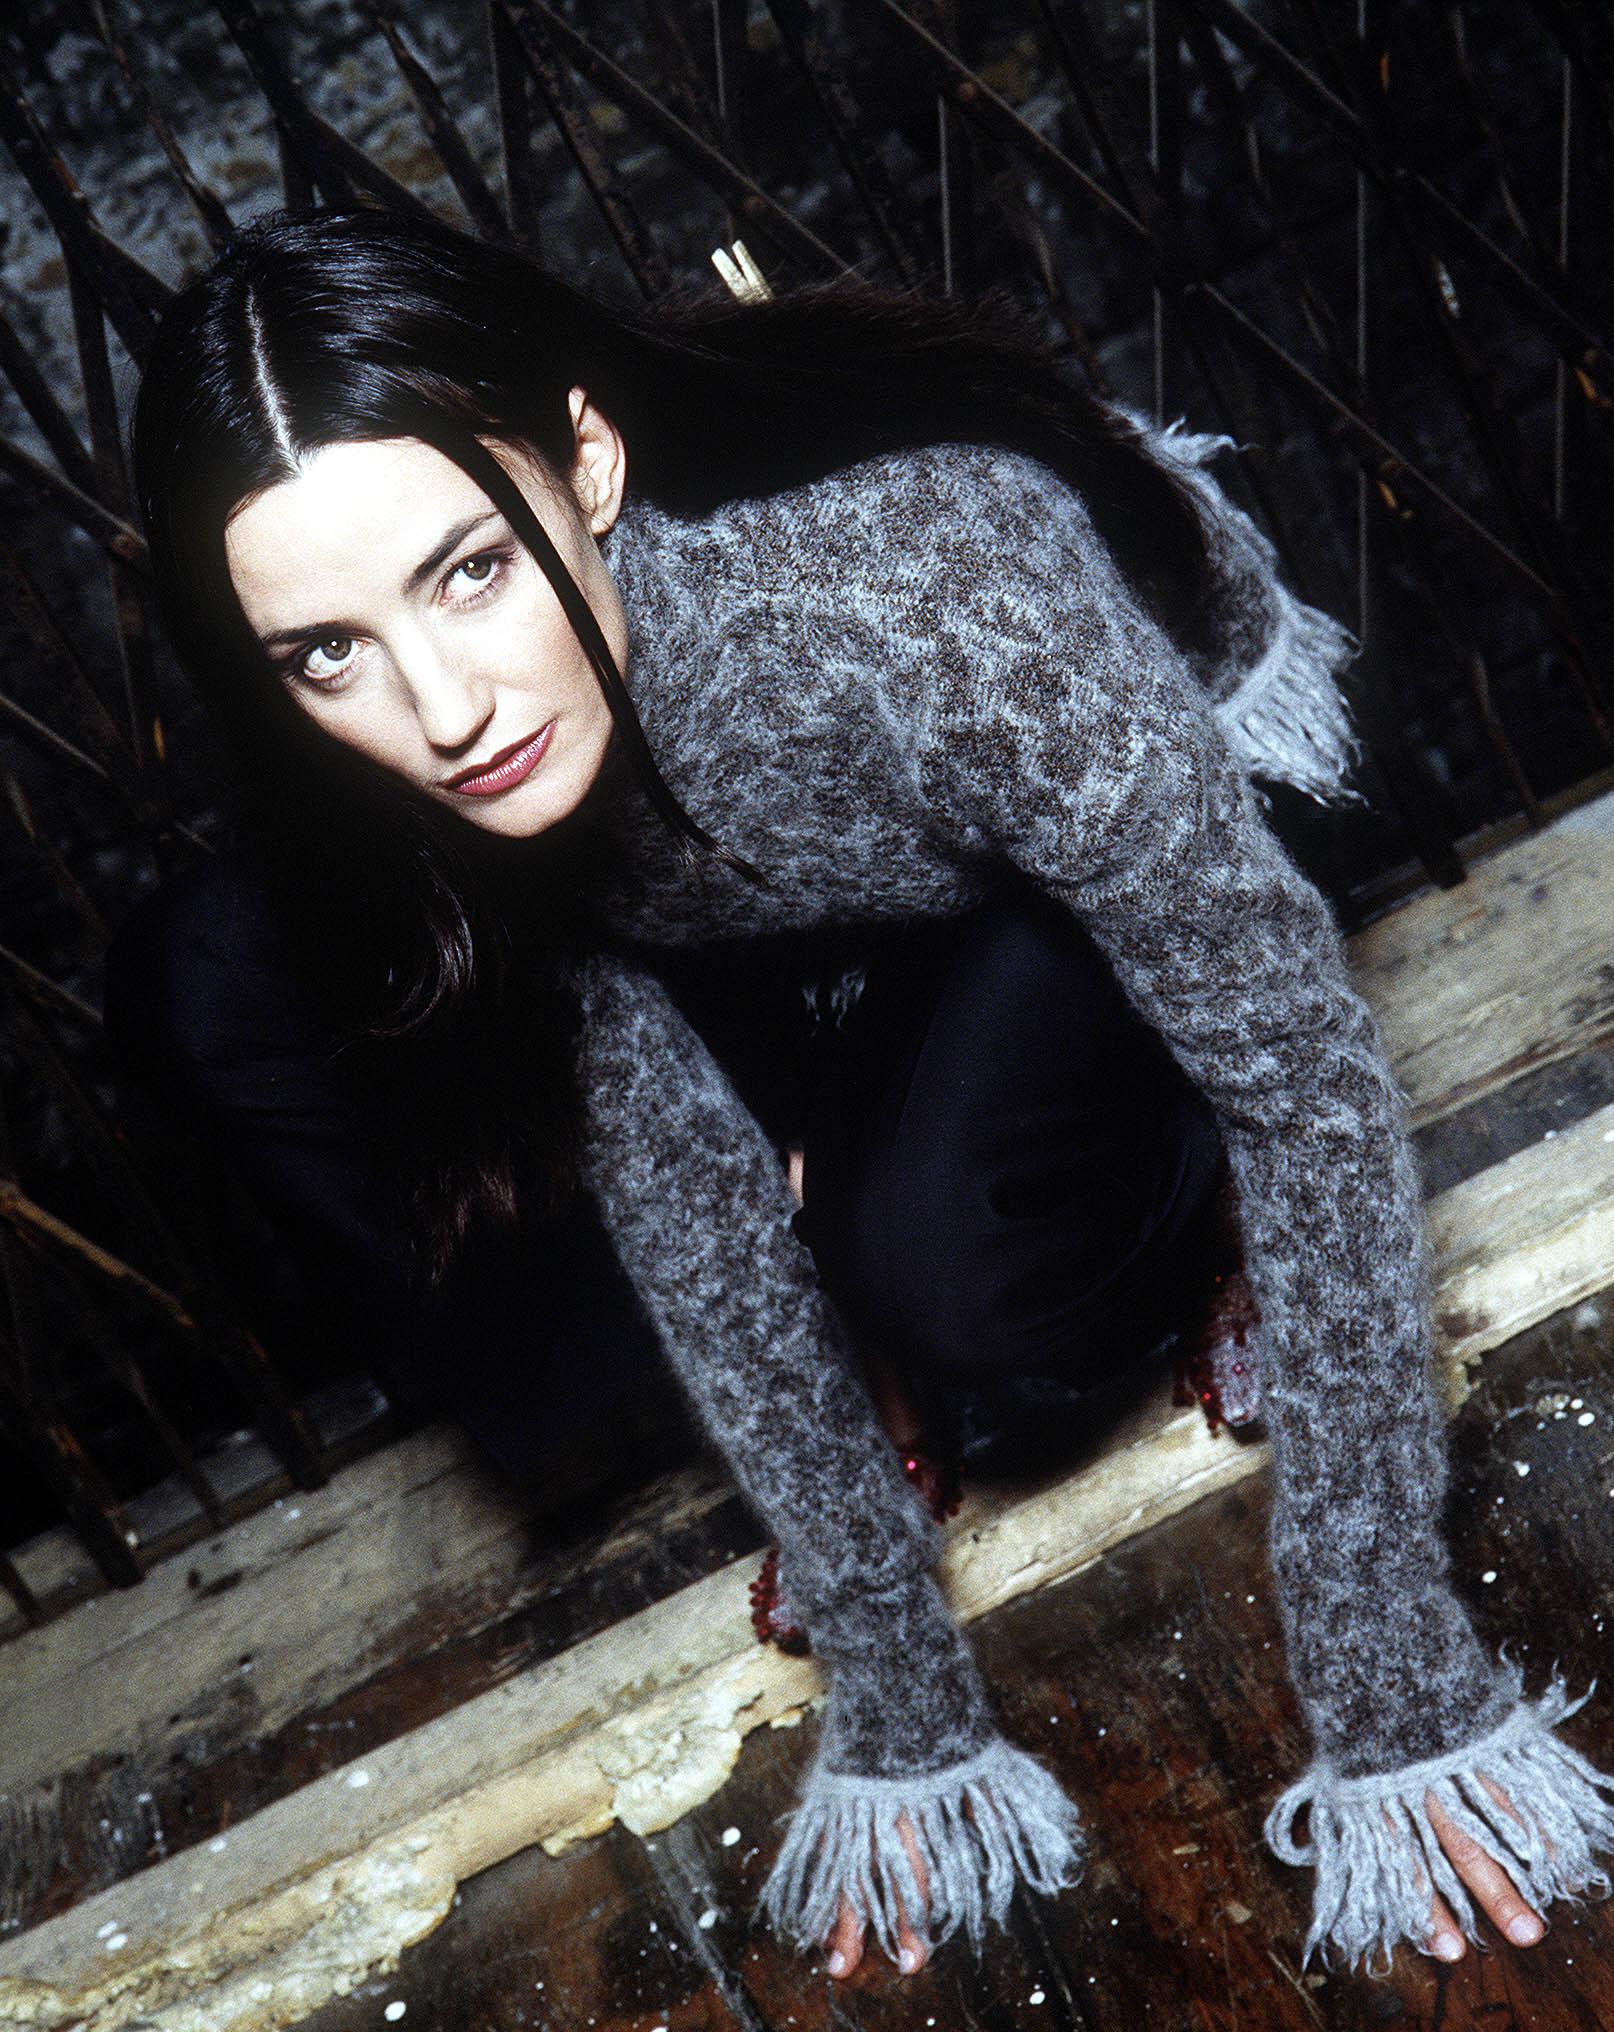 Orla Brady Photoshoot with Sven Arnstein (1999)